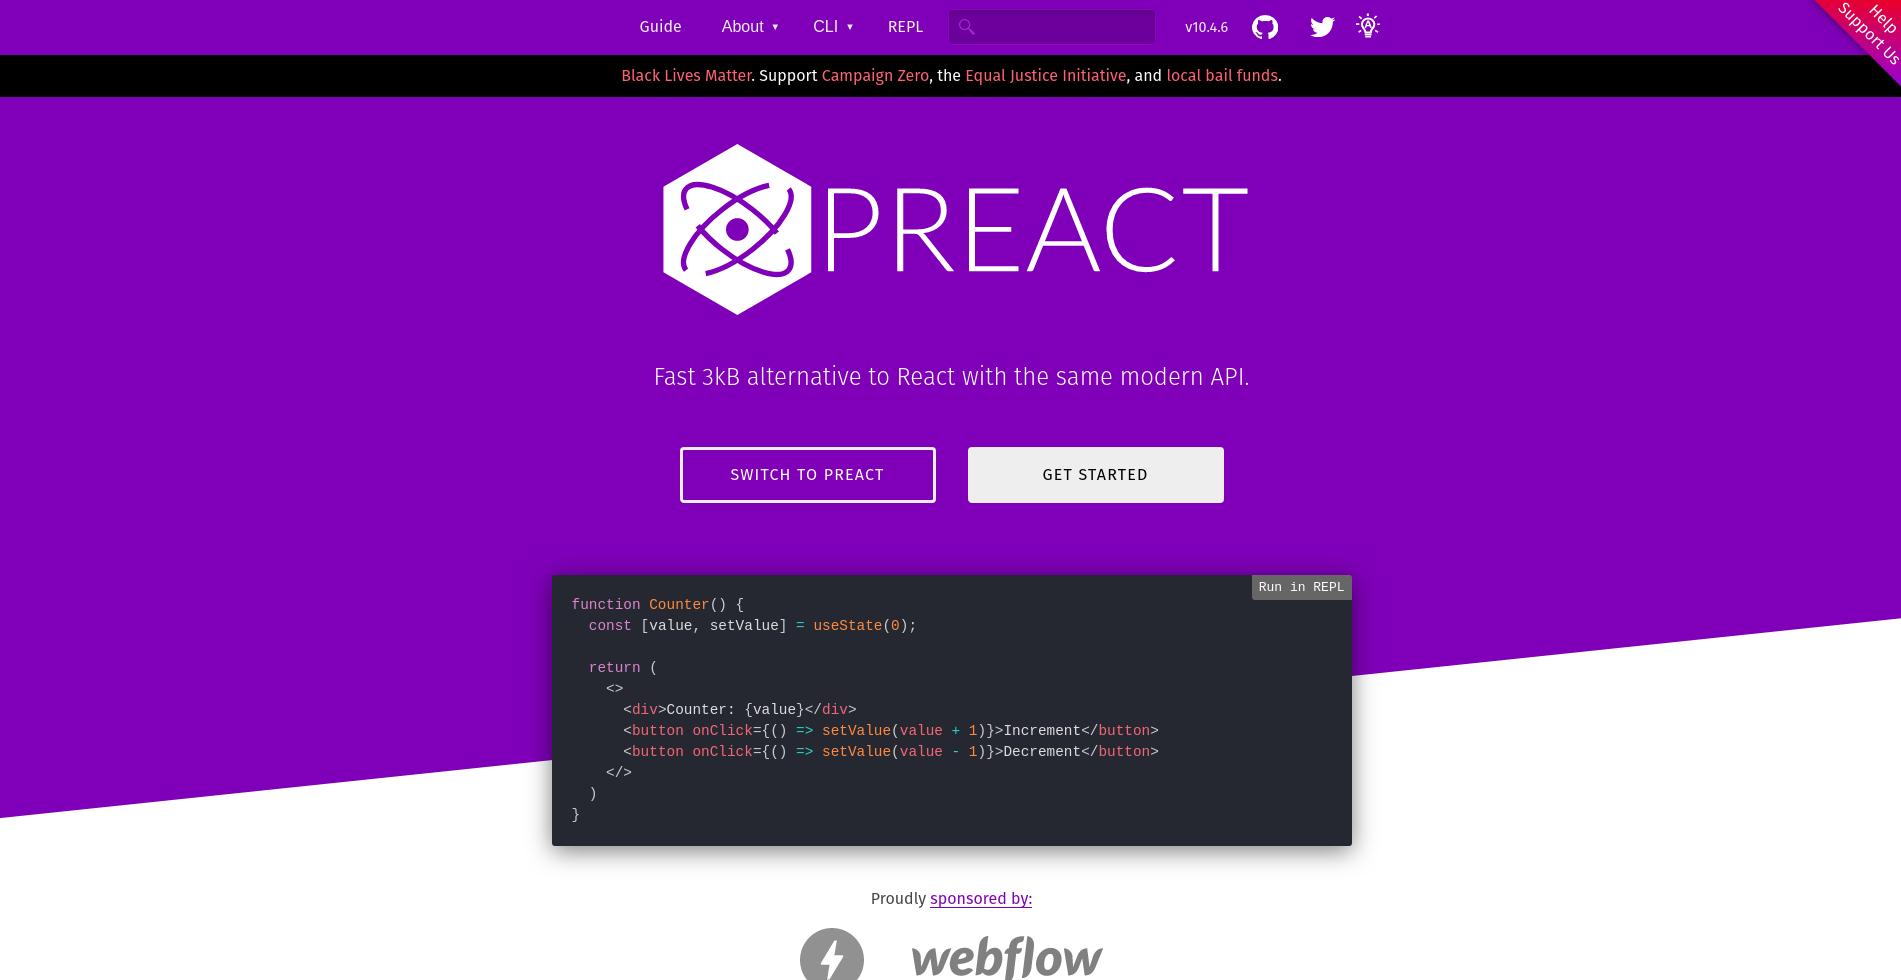 Preact landing page